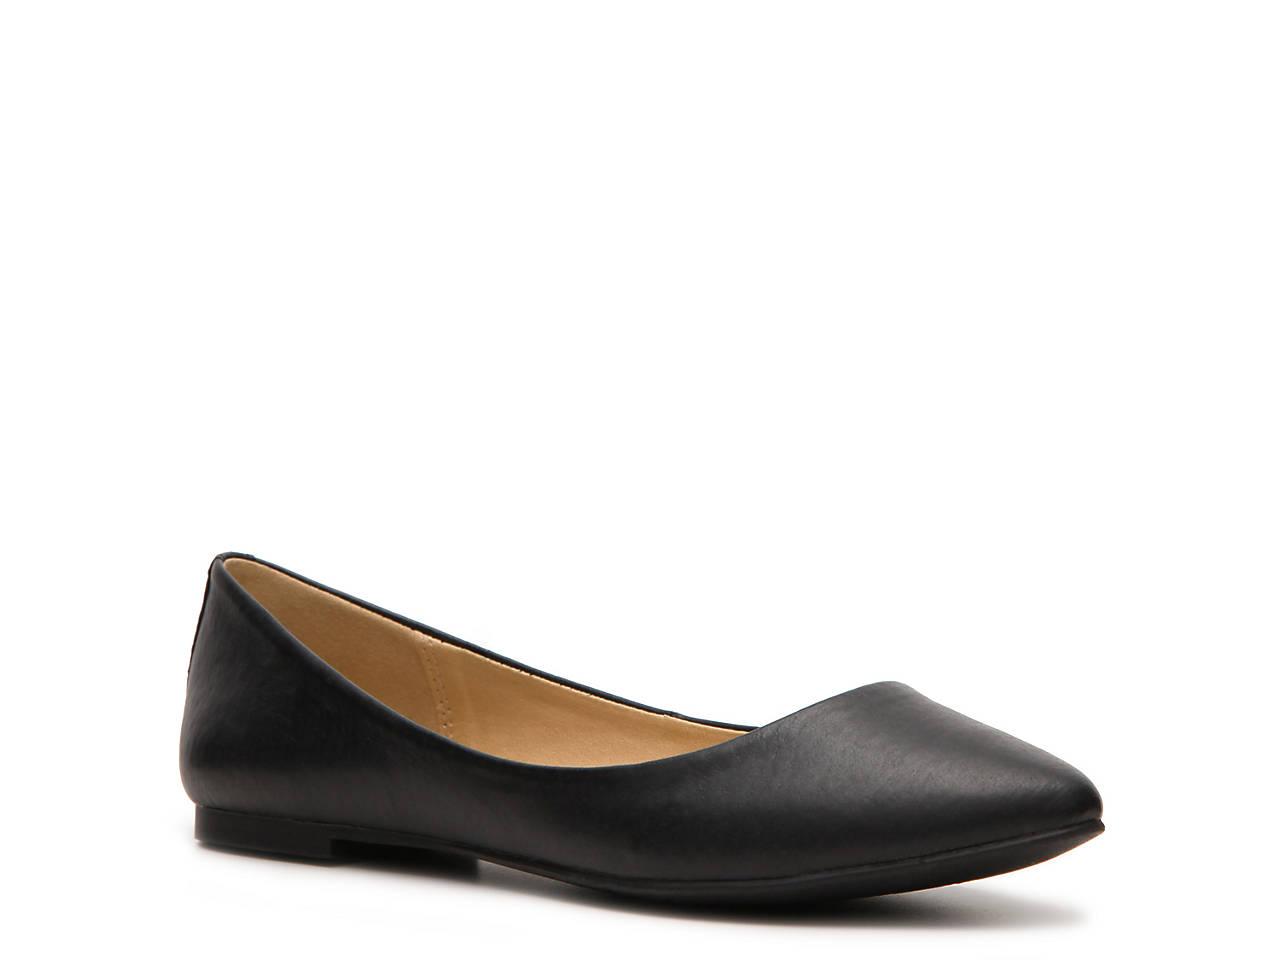 1b8636bcafcb Steve Madden Angel Leather Flat Women s Shoes